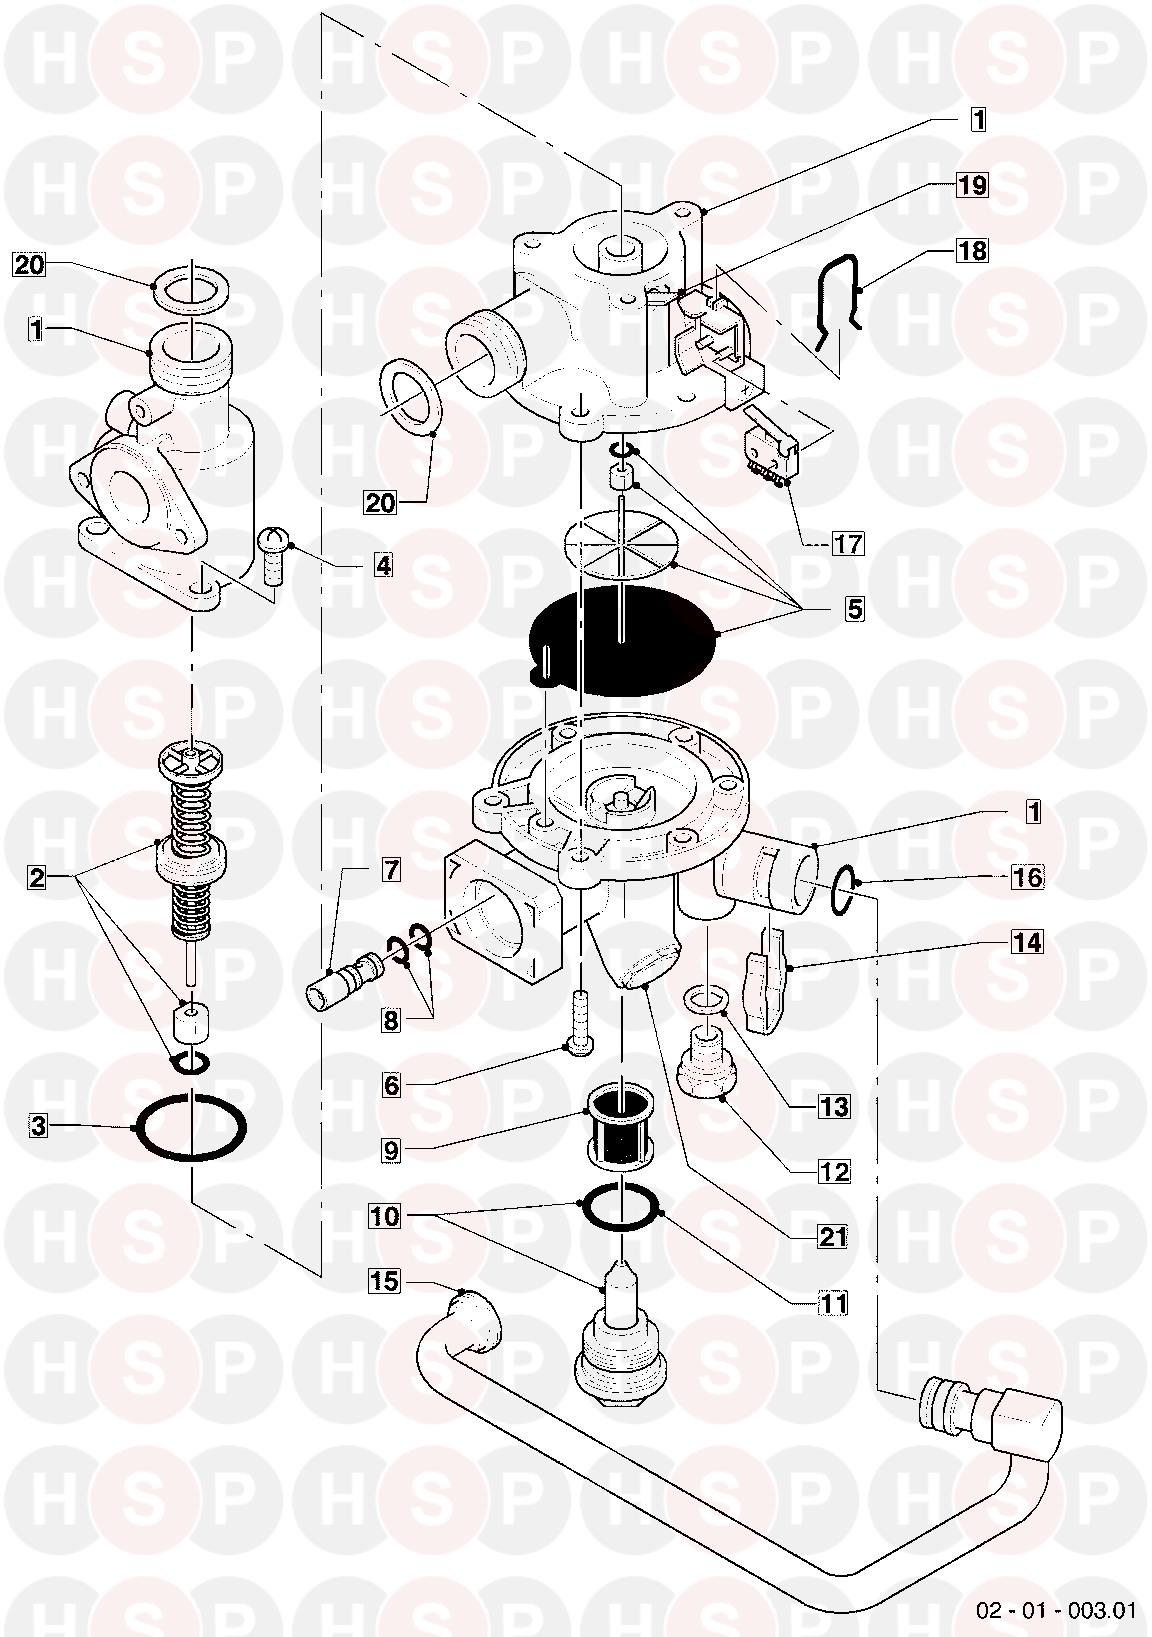 Vaillant TURBOMAX VUW 282E 1995-1999 Appliance Diagram (01